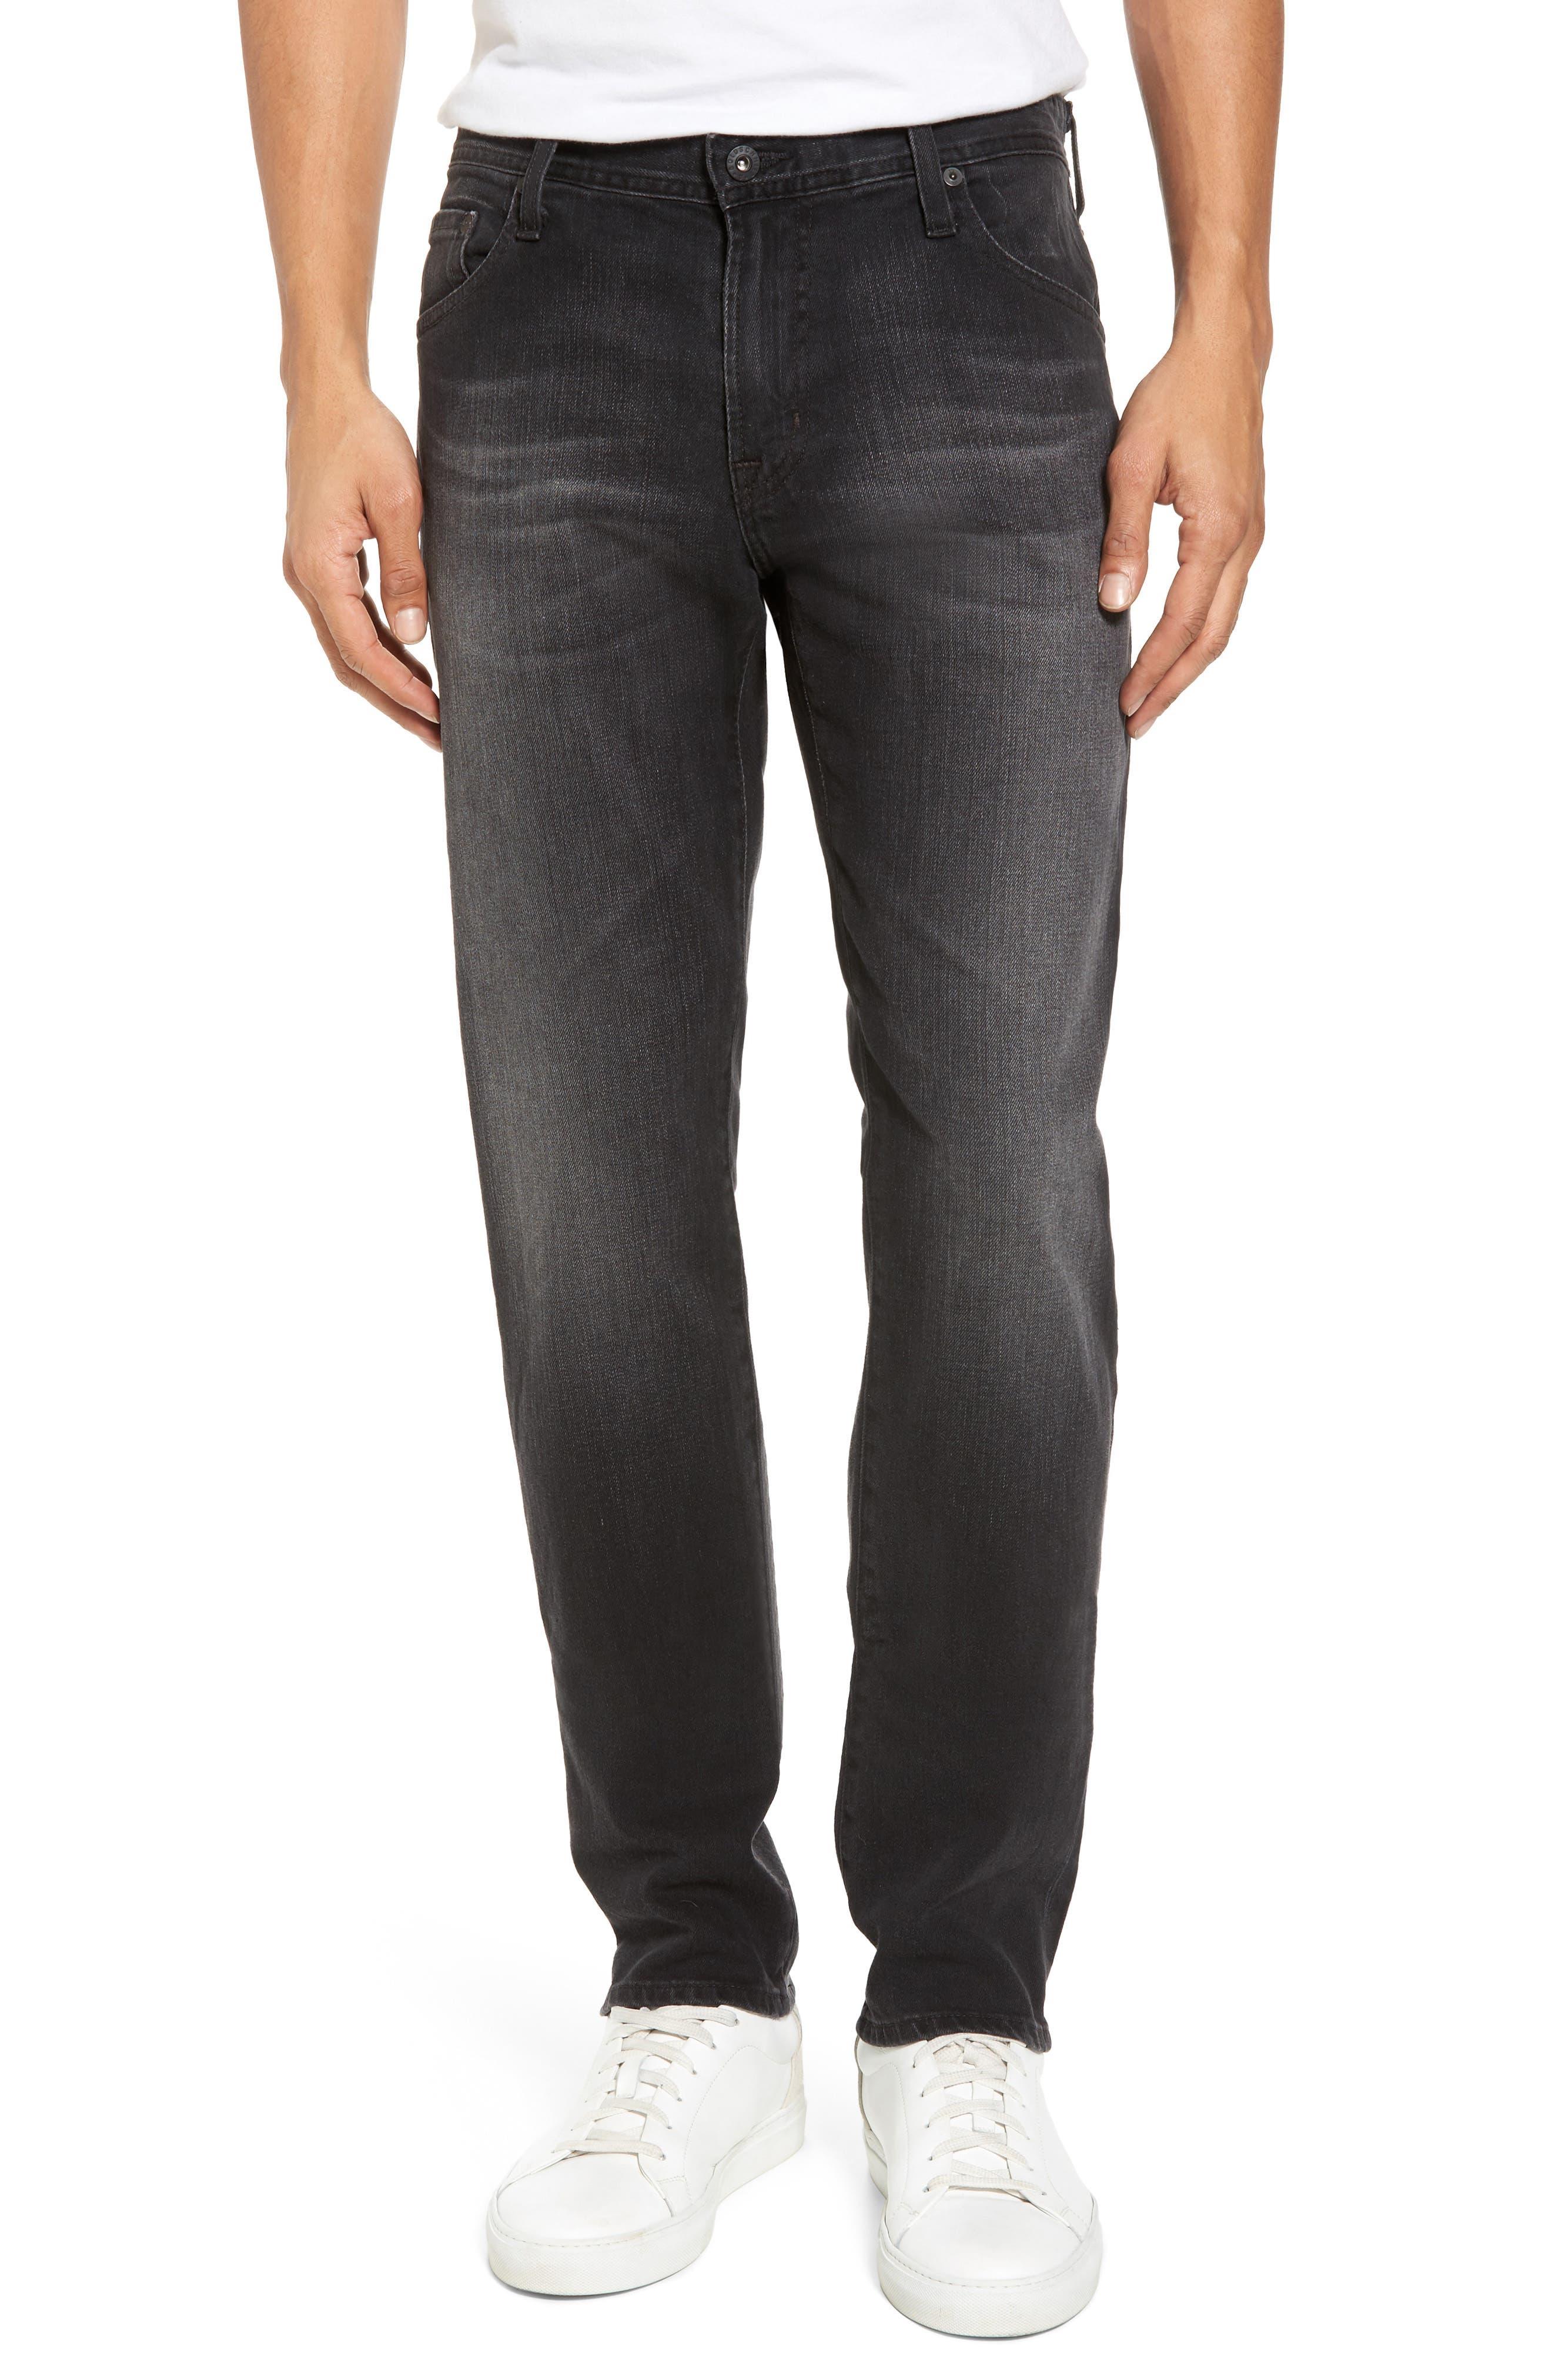 Tellis Modern Slim Fit Jeans,                             Main thumbnail 1, color,                             Smudged Black